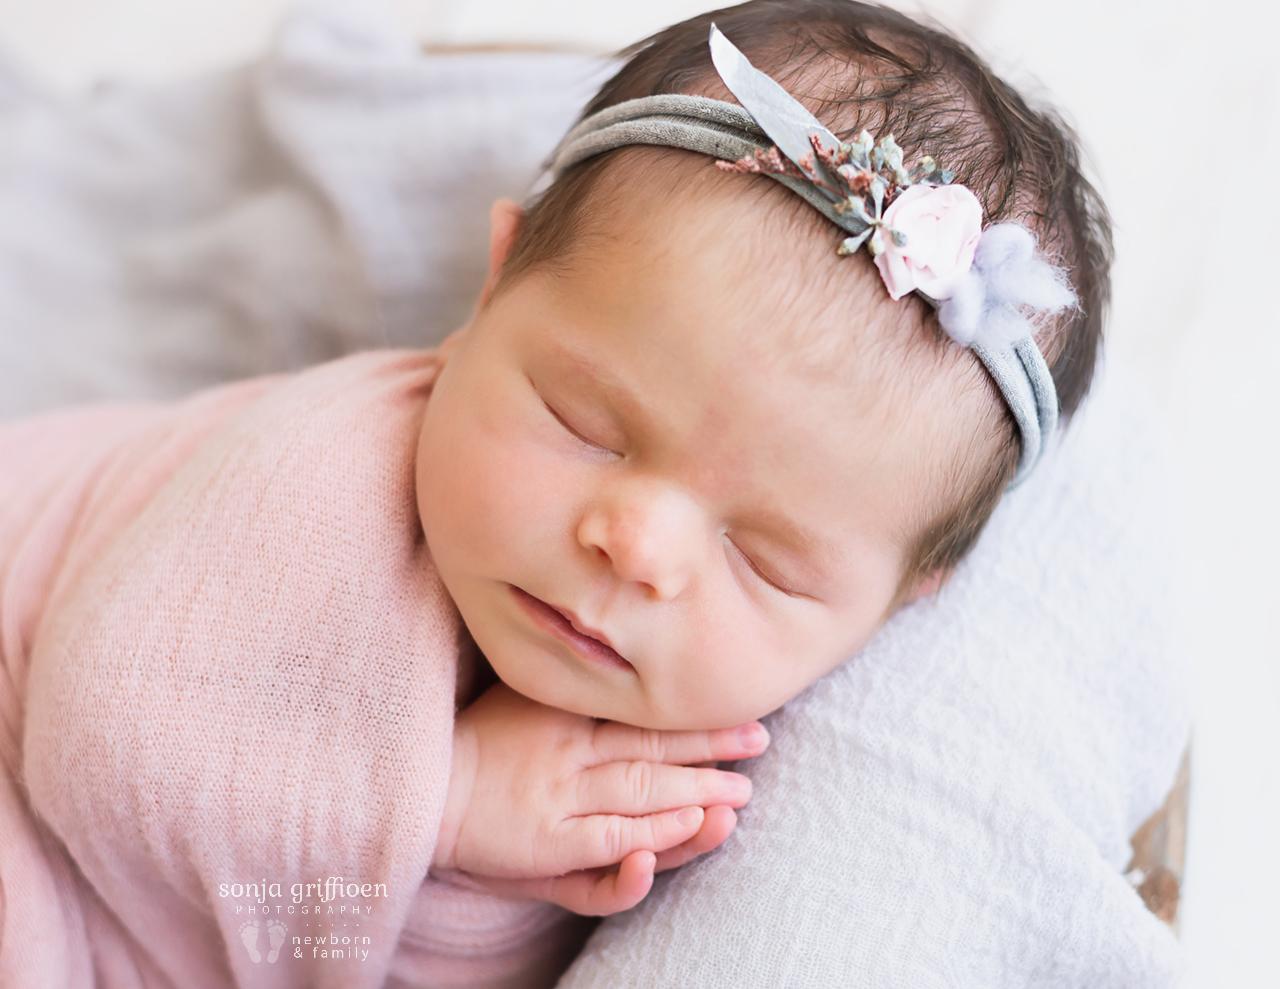 Alessia-Newborn-Brisbane-Newborn-Photographer-Sonja-Griffioen-13b.jpg